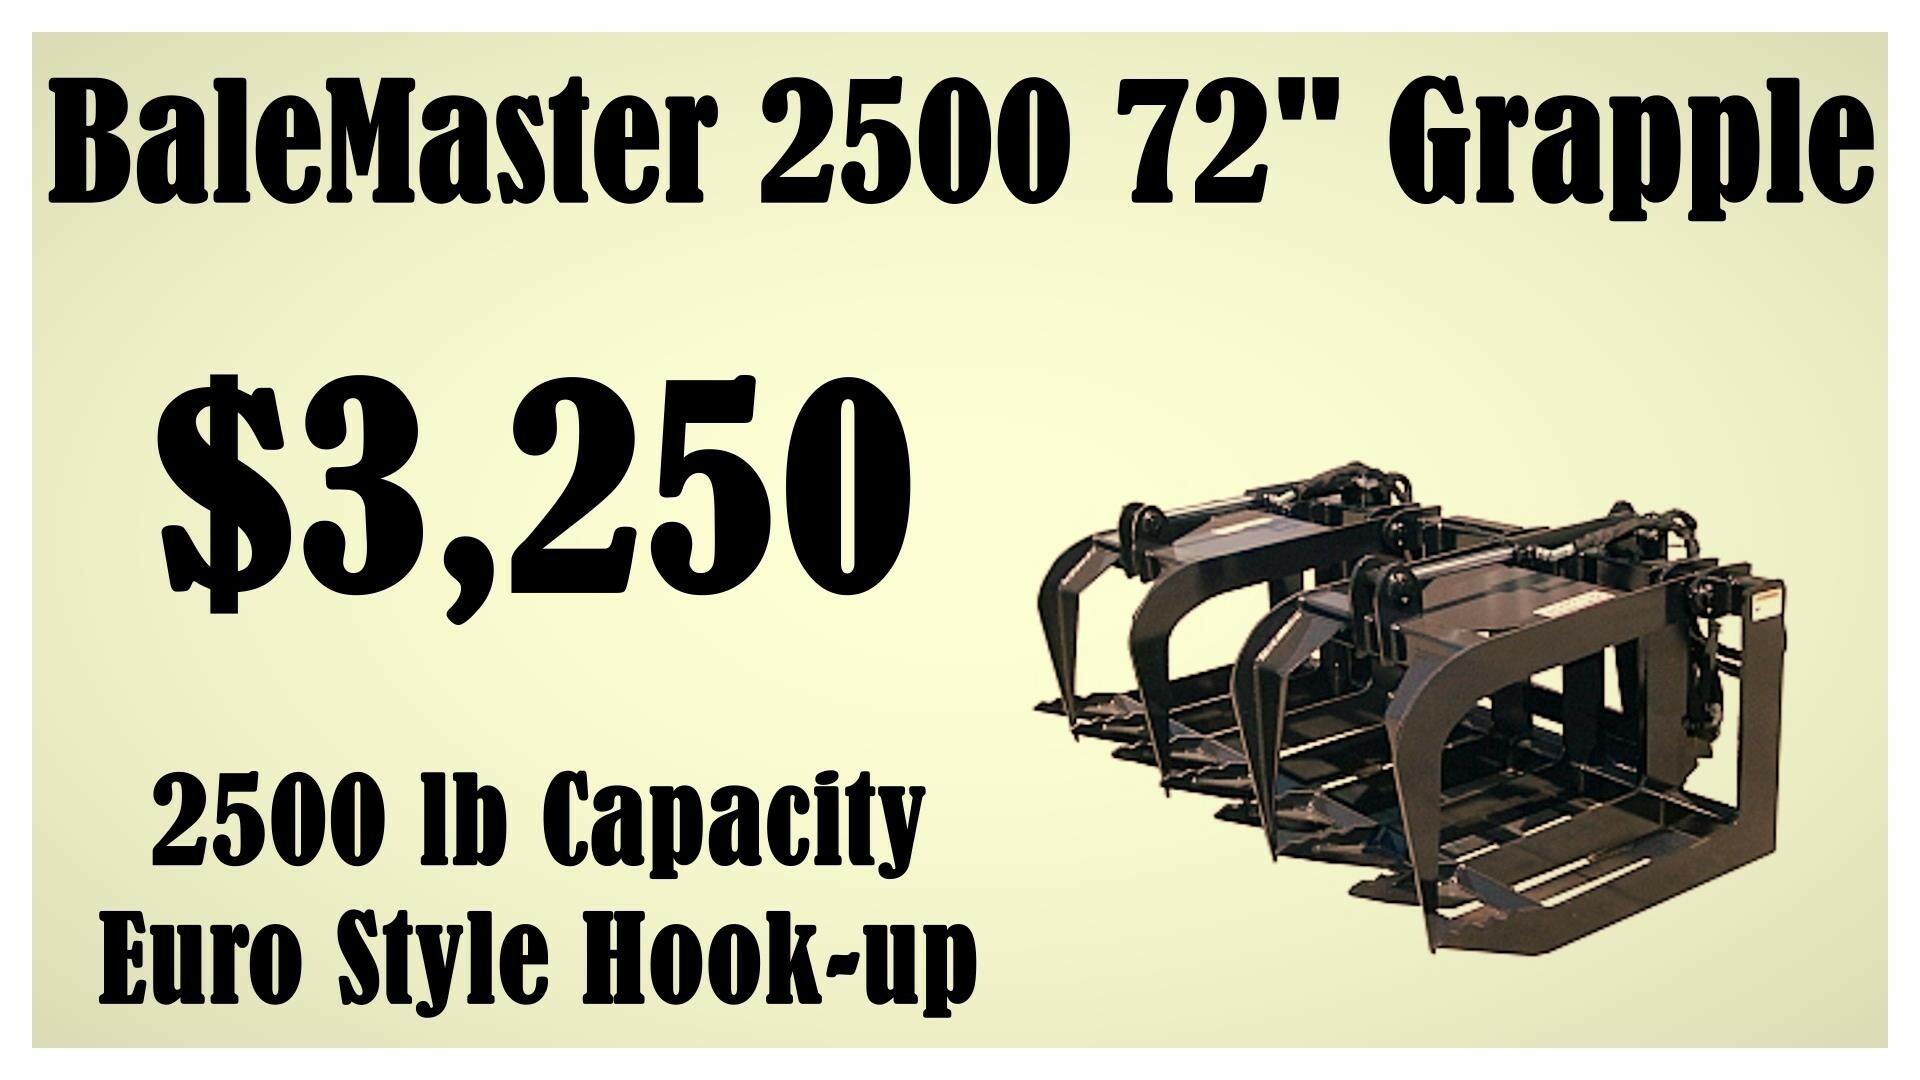 BALEMASTER MFG 2500 Loader and Skid Steer Attachment